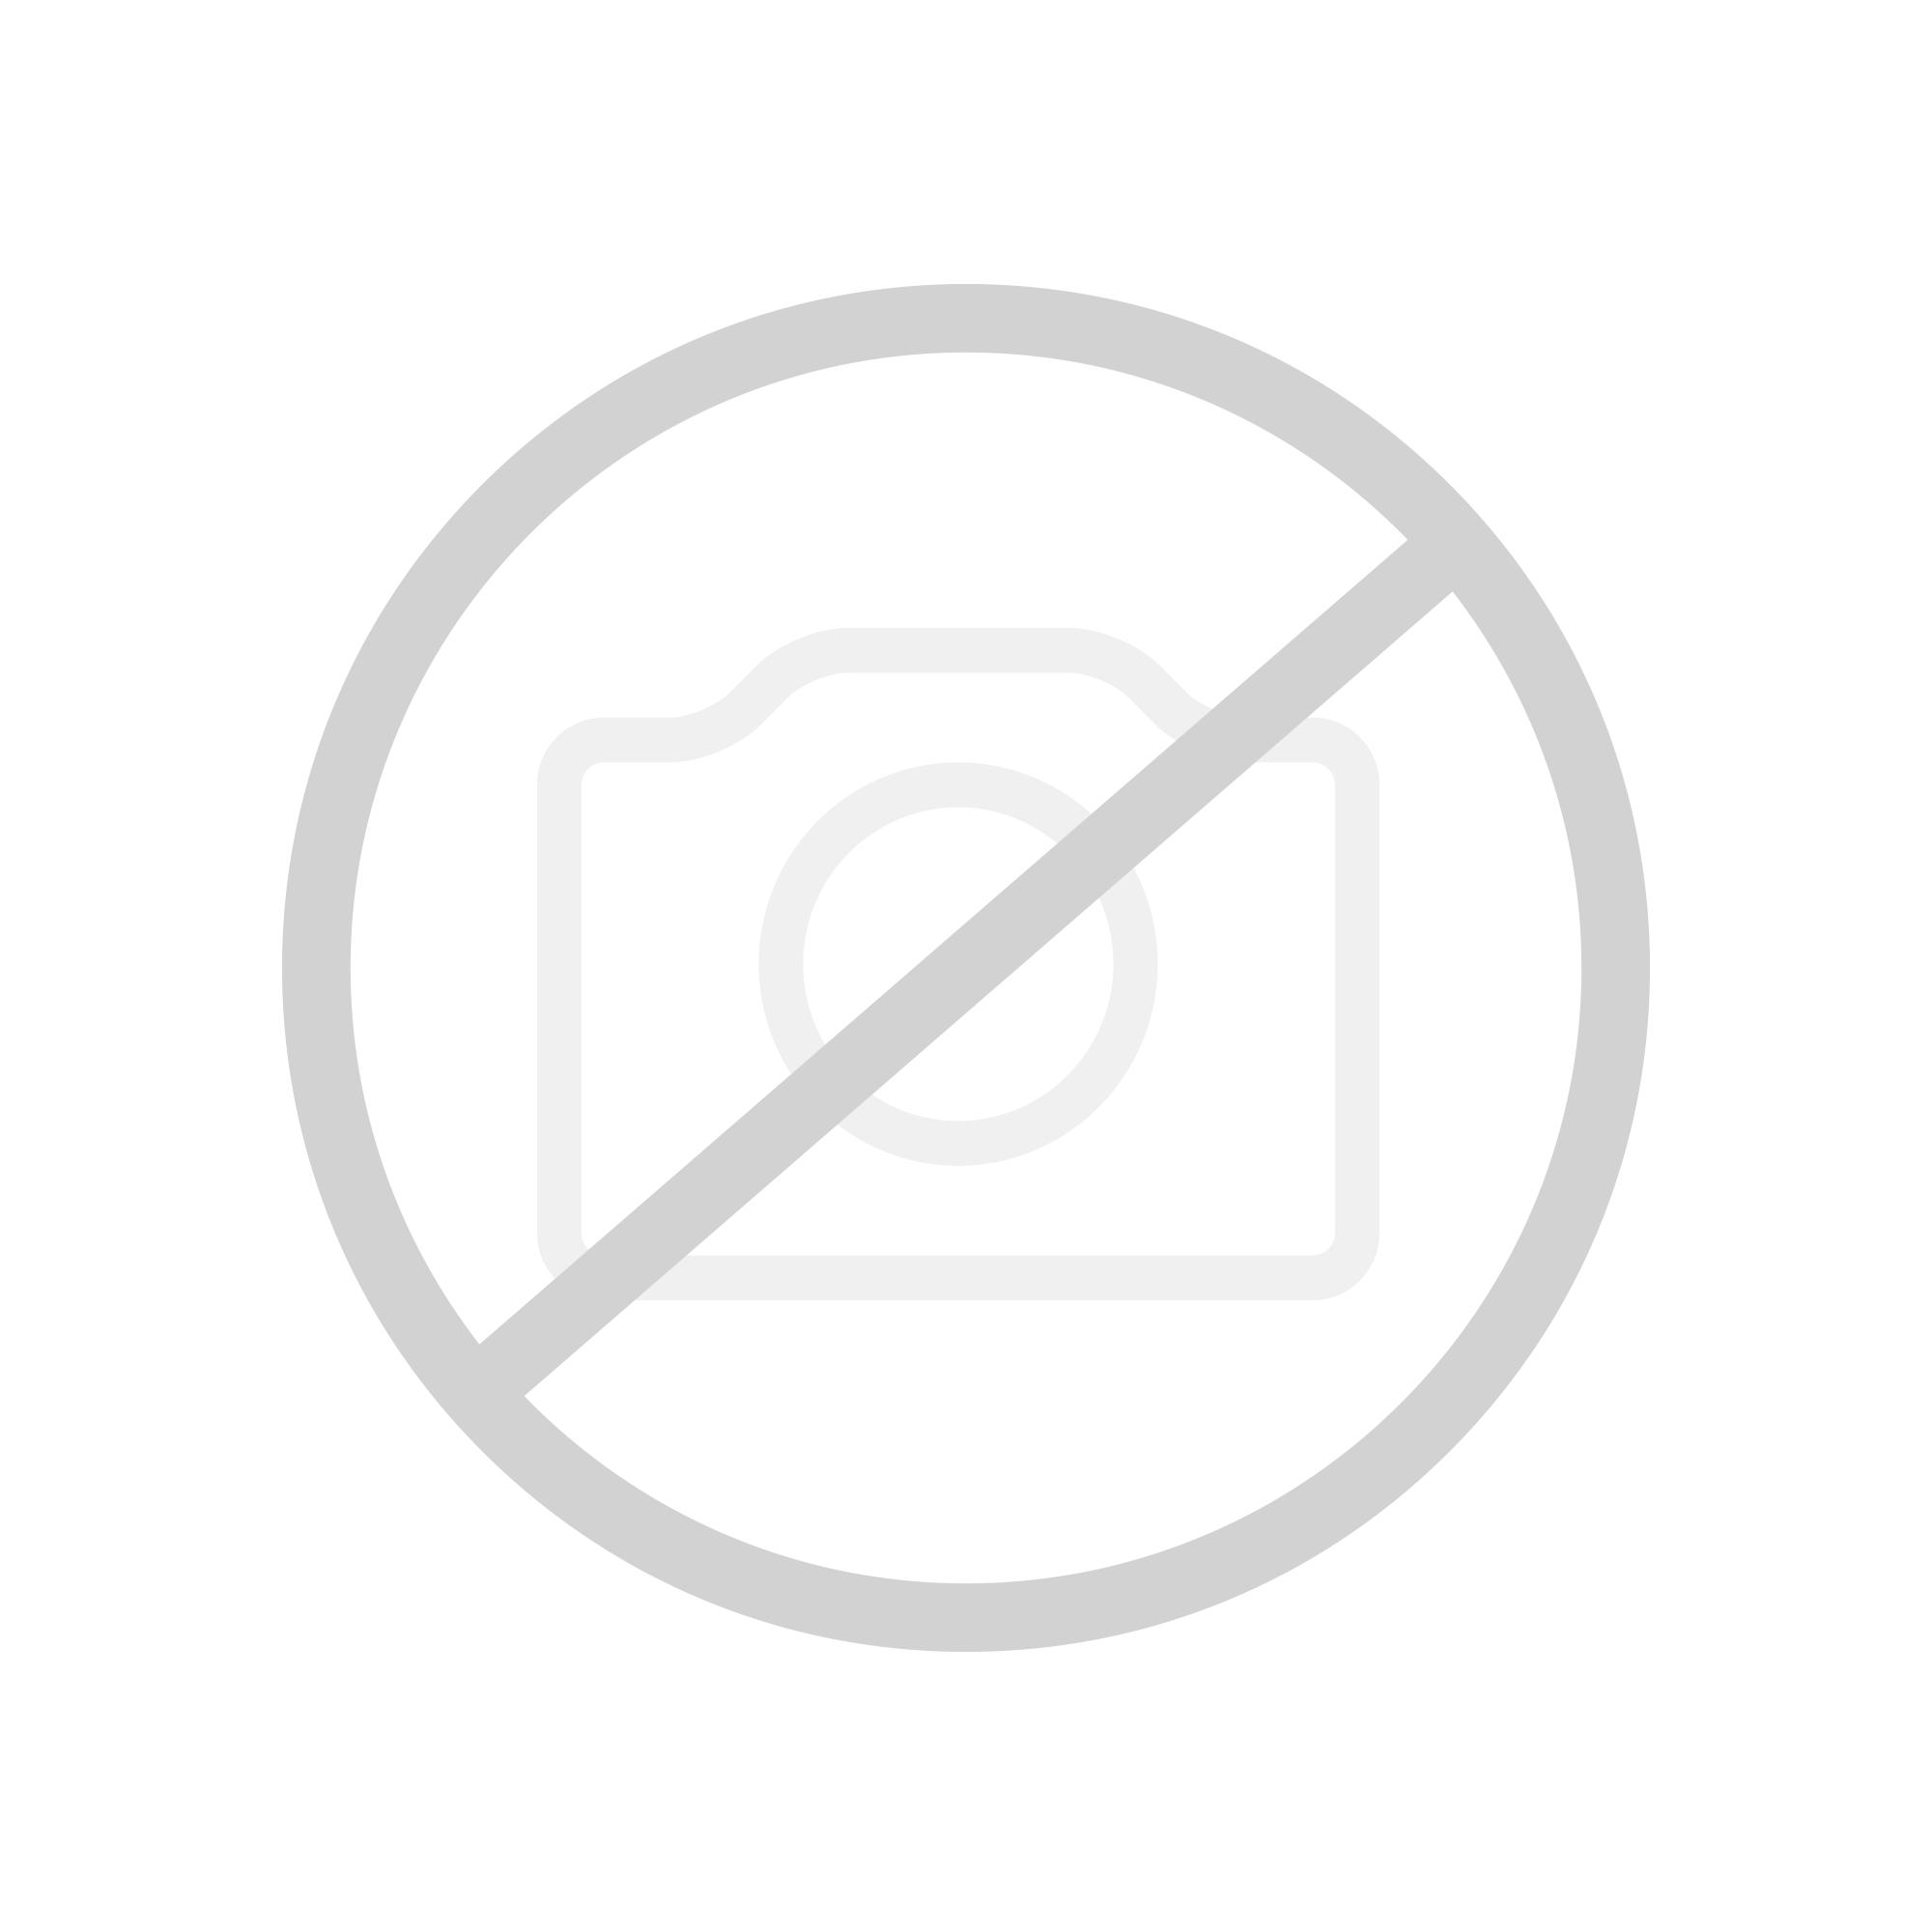 Grohe Schraubring 46460 mit Hülse f. Eurostyle/Eurosmart f. EHM WT/Bidet 46460000